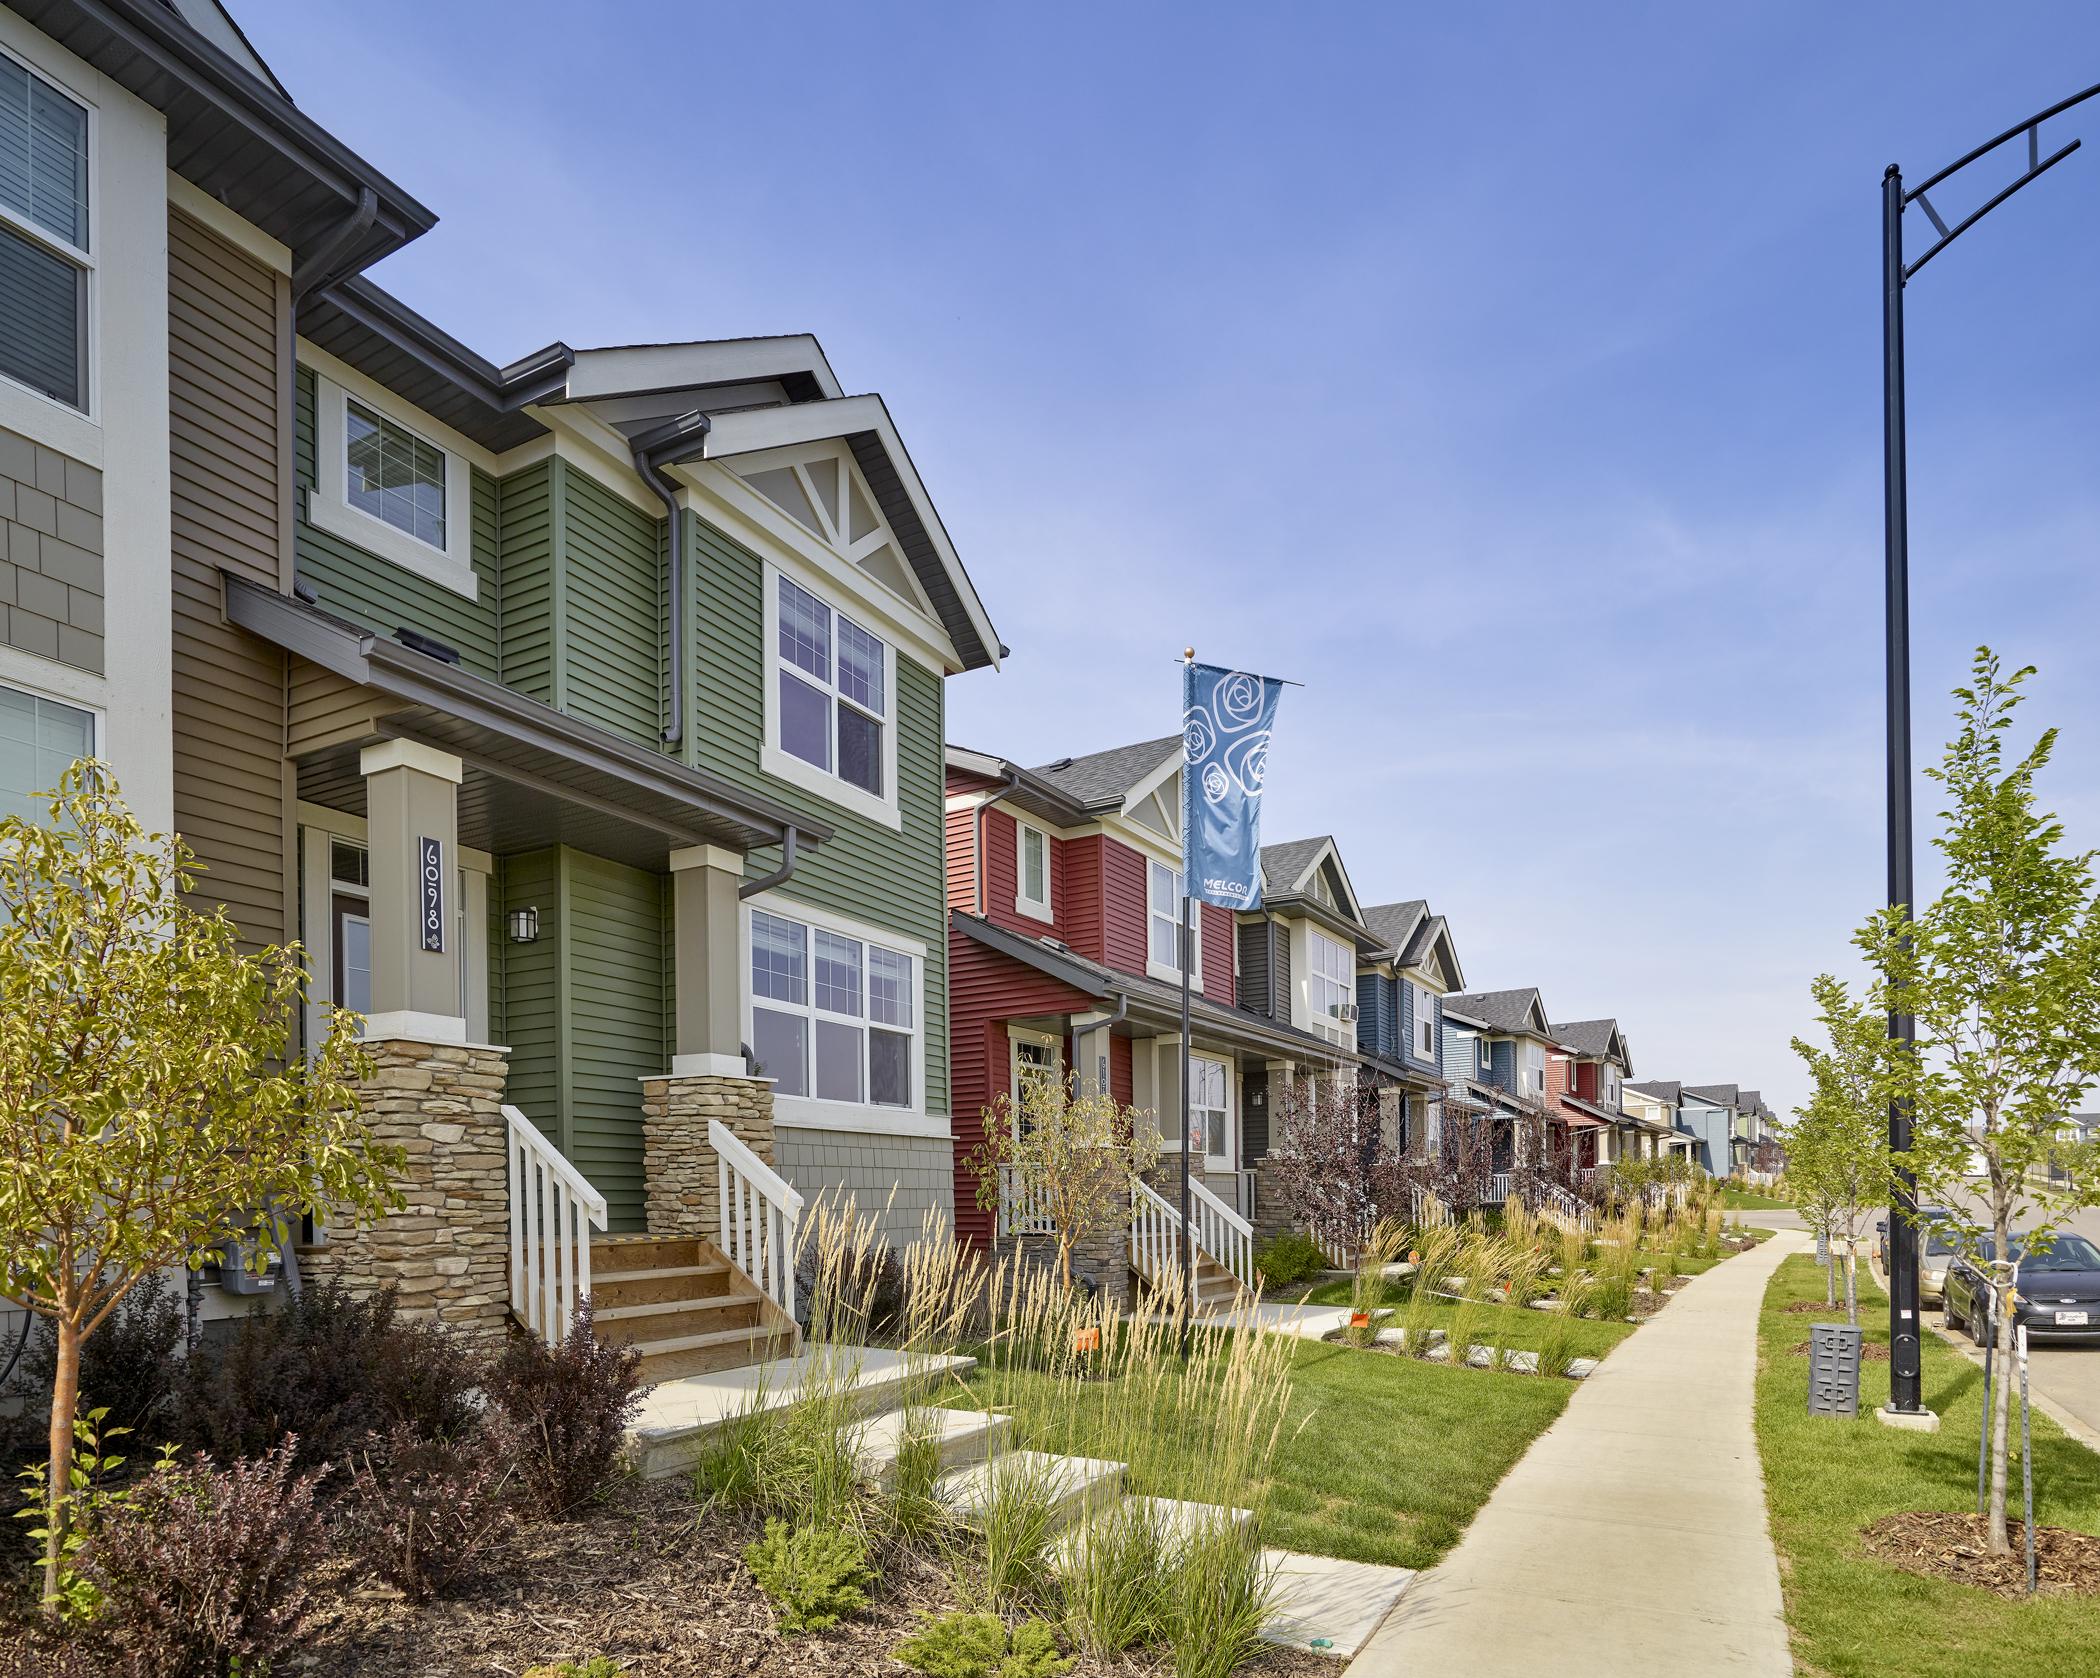 Neighborhood Profile: Rosenthal